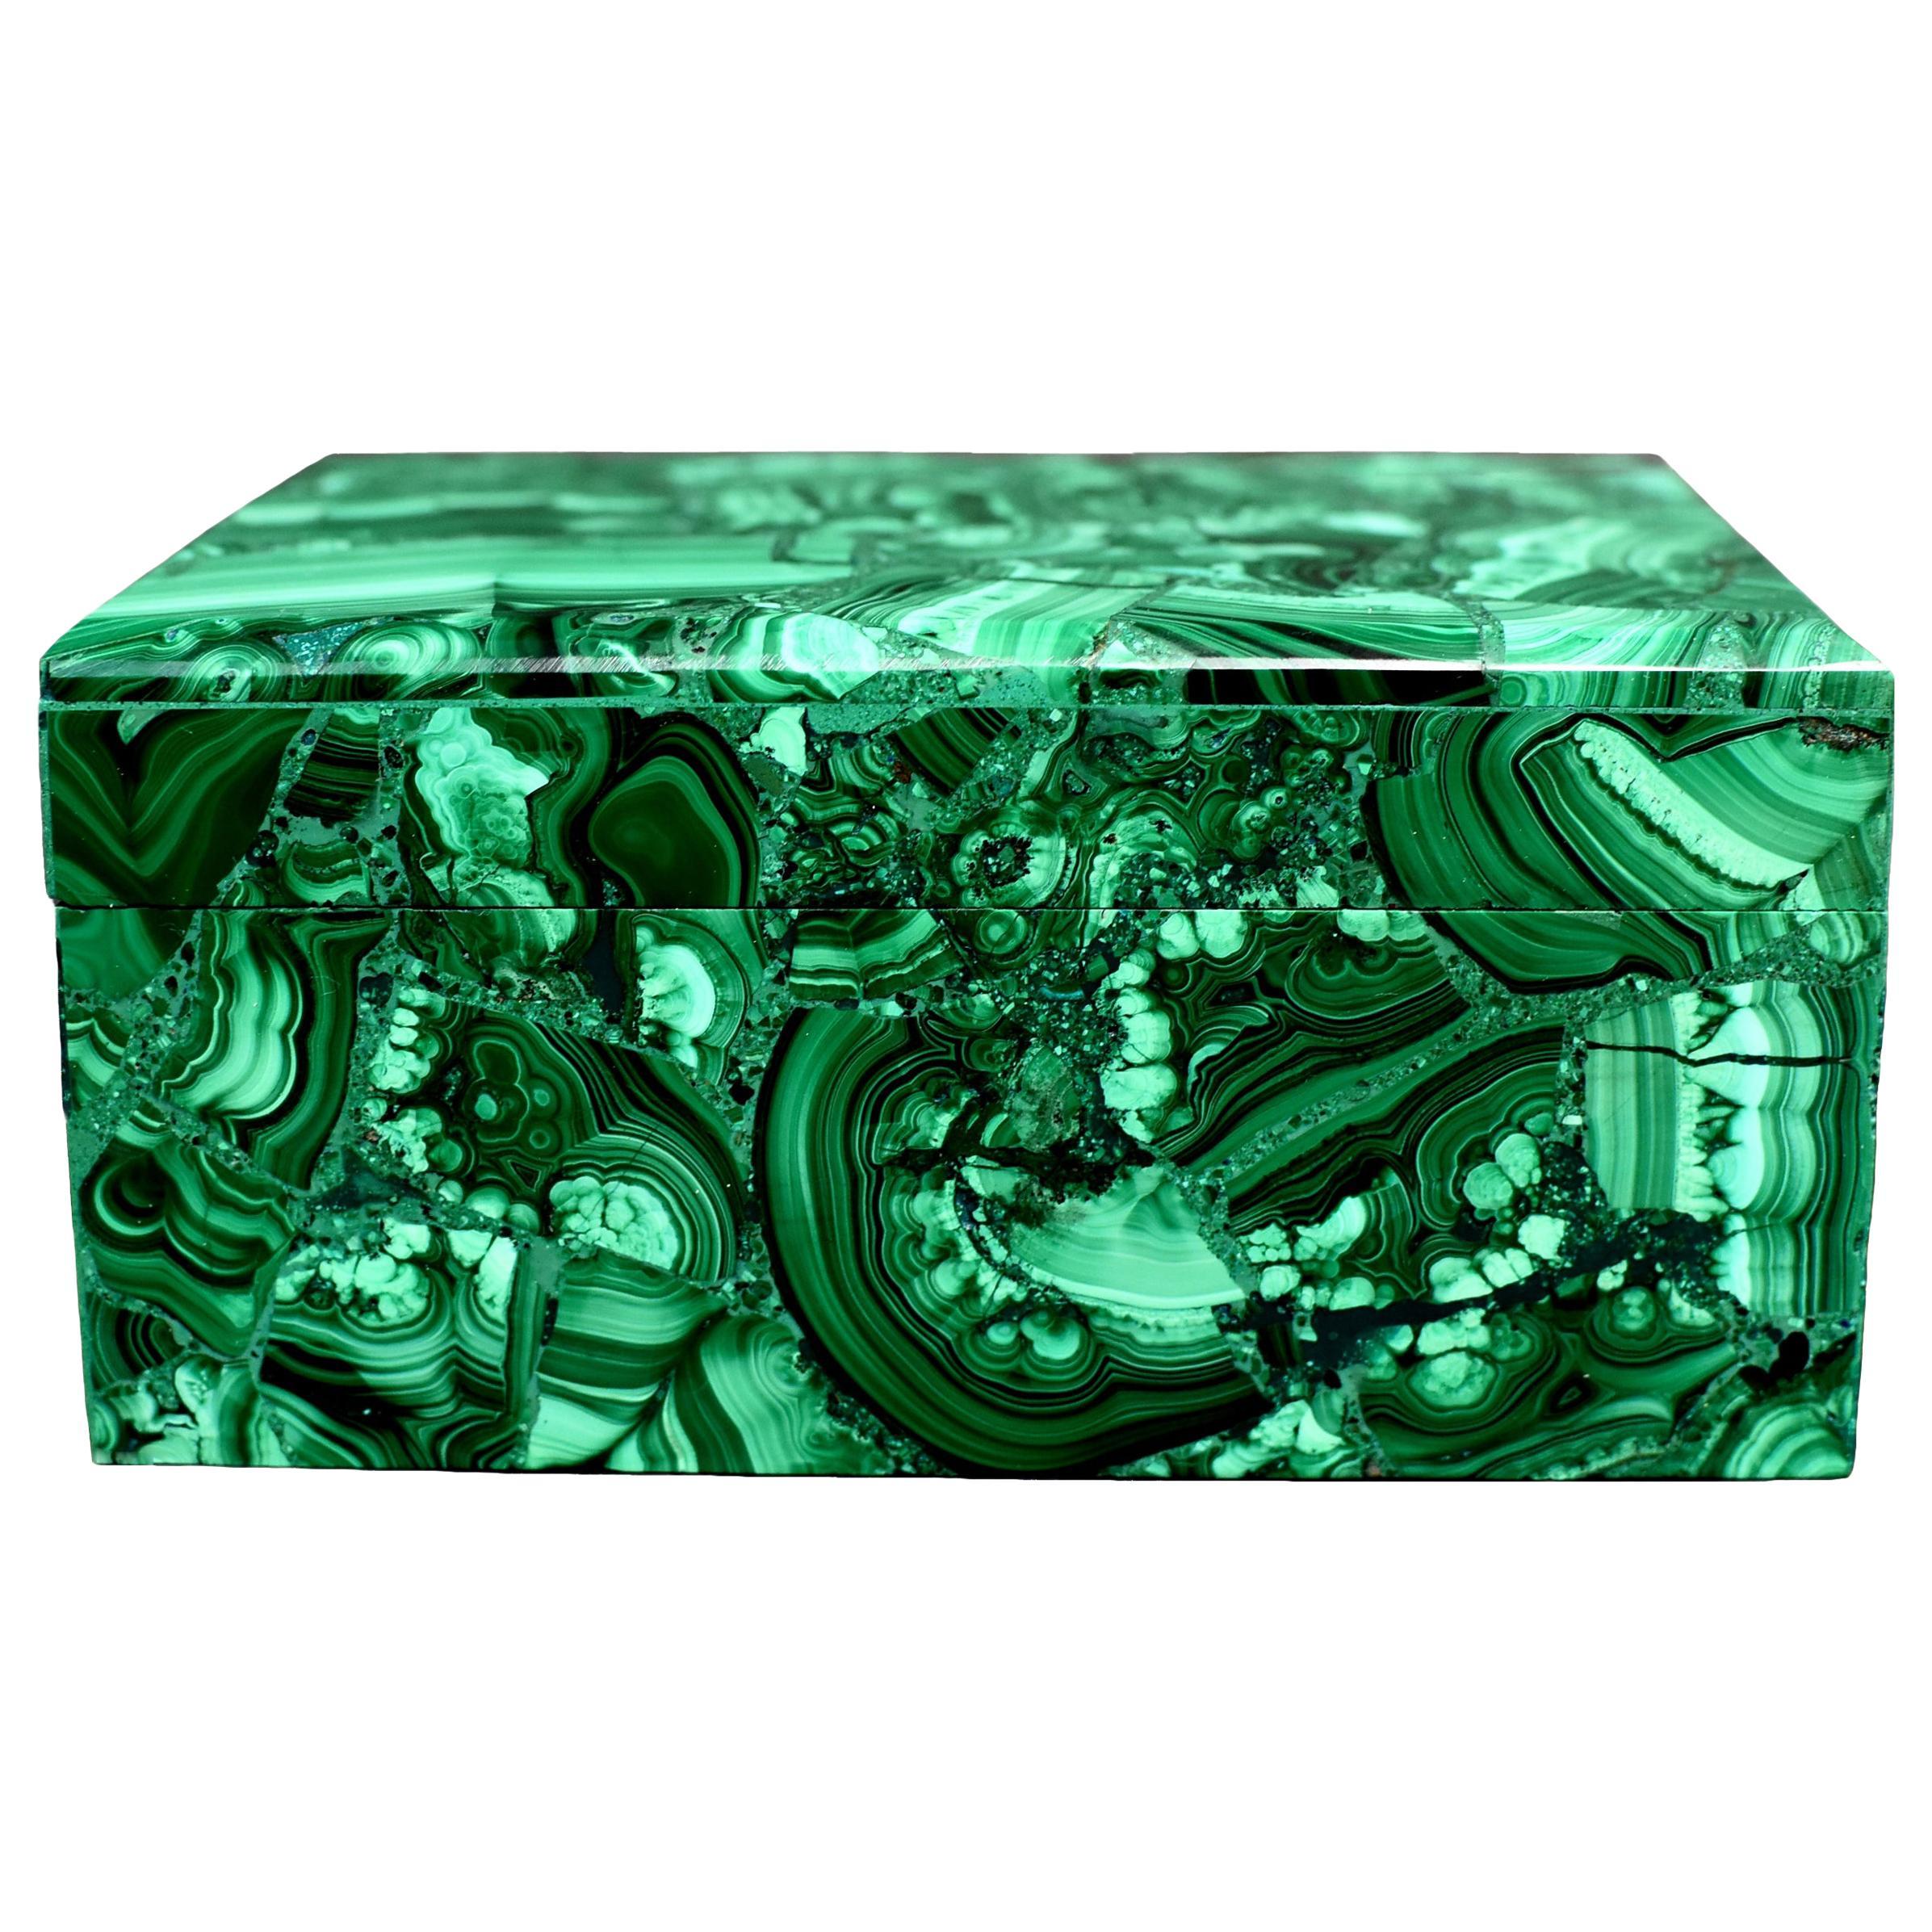 Natural Malachite Box, Large 3 lb Full Slab Jewelry Box